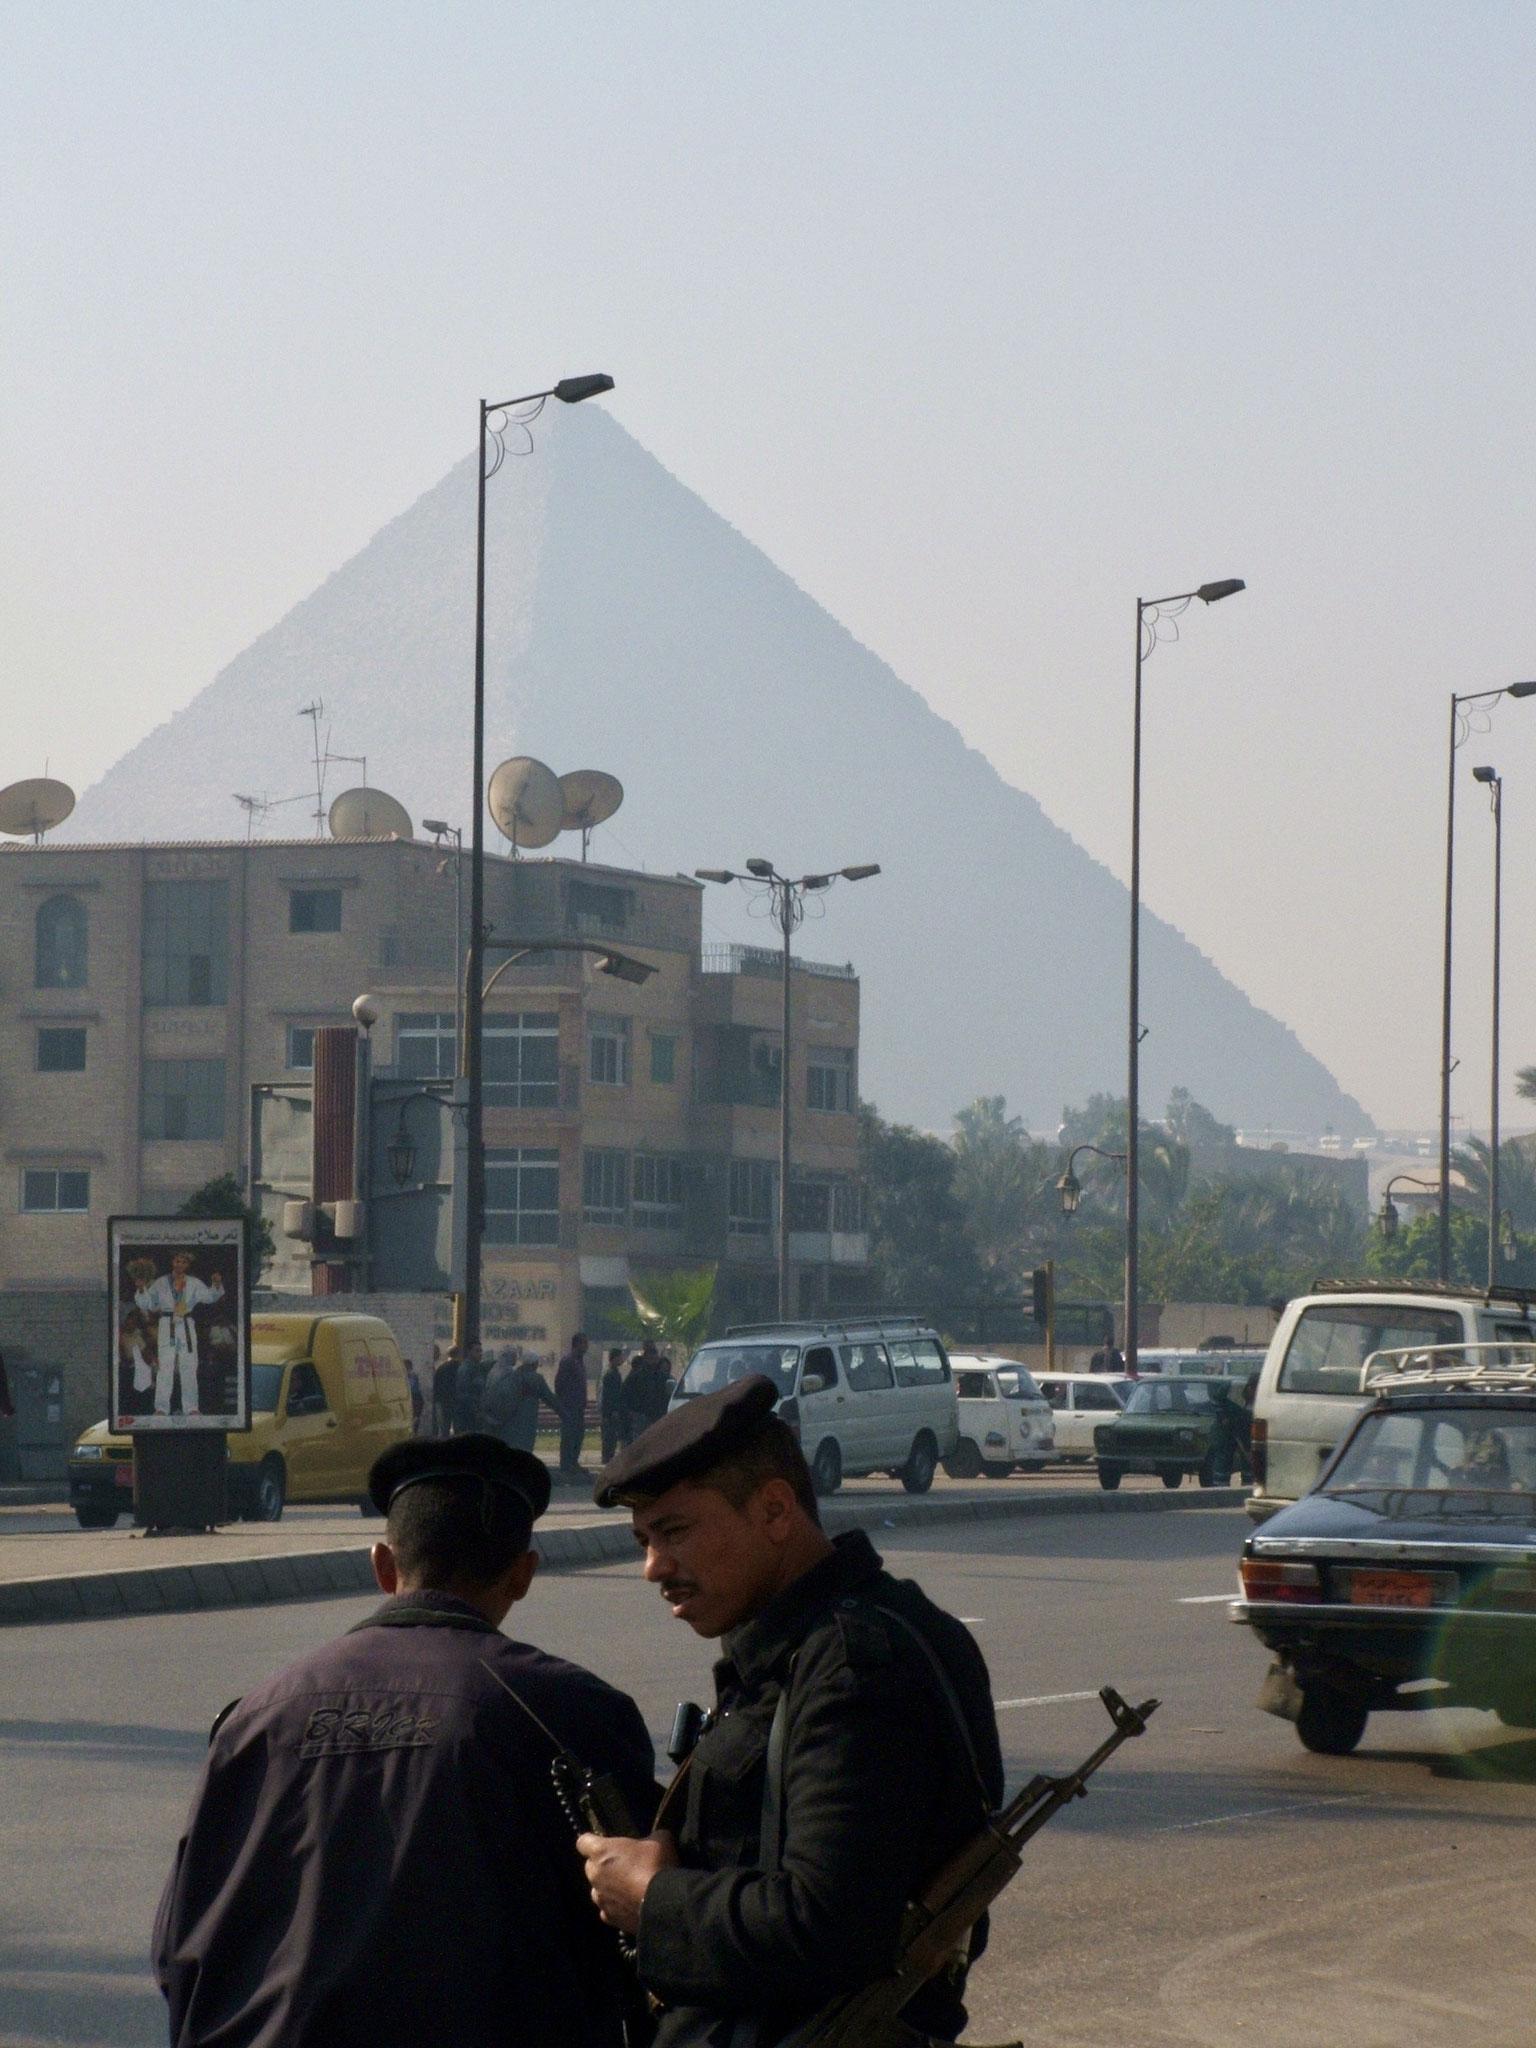 Pyramids and police